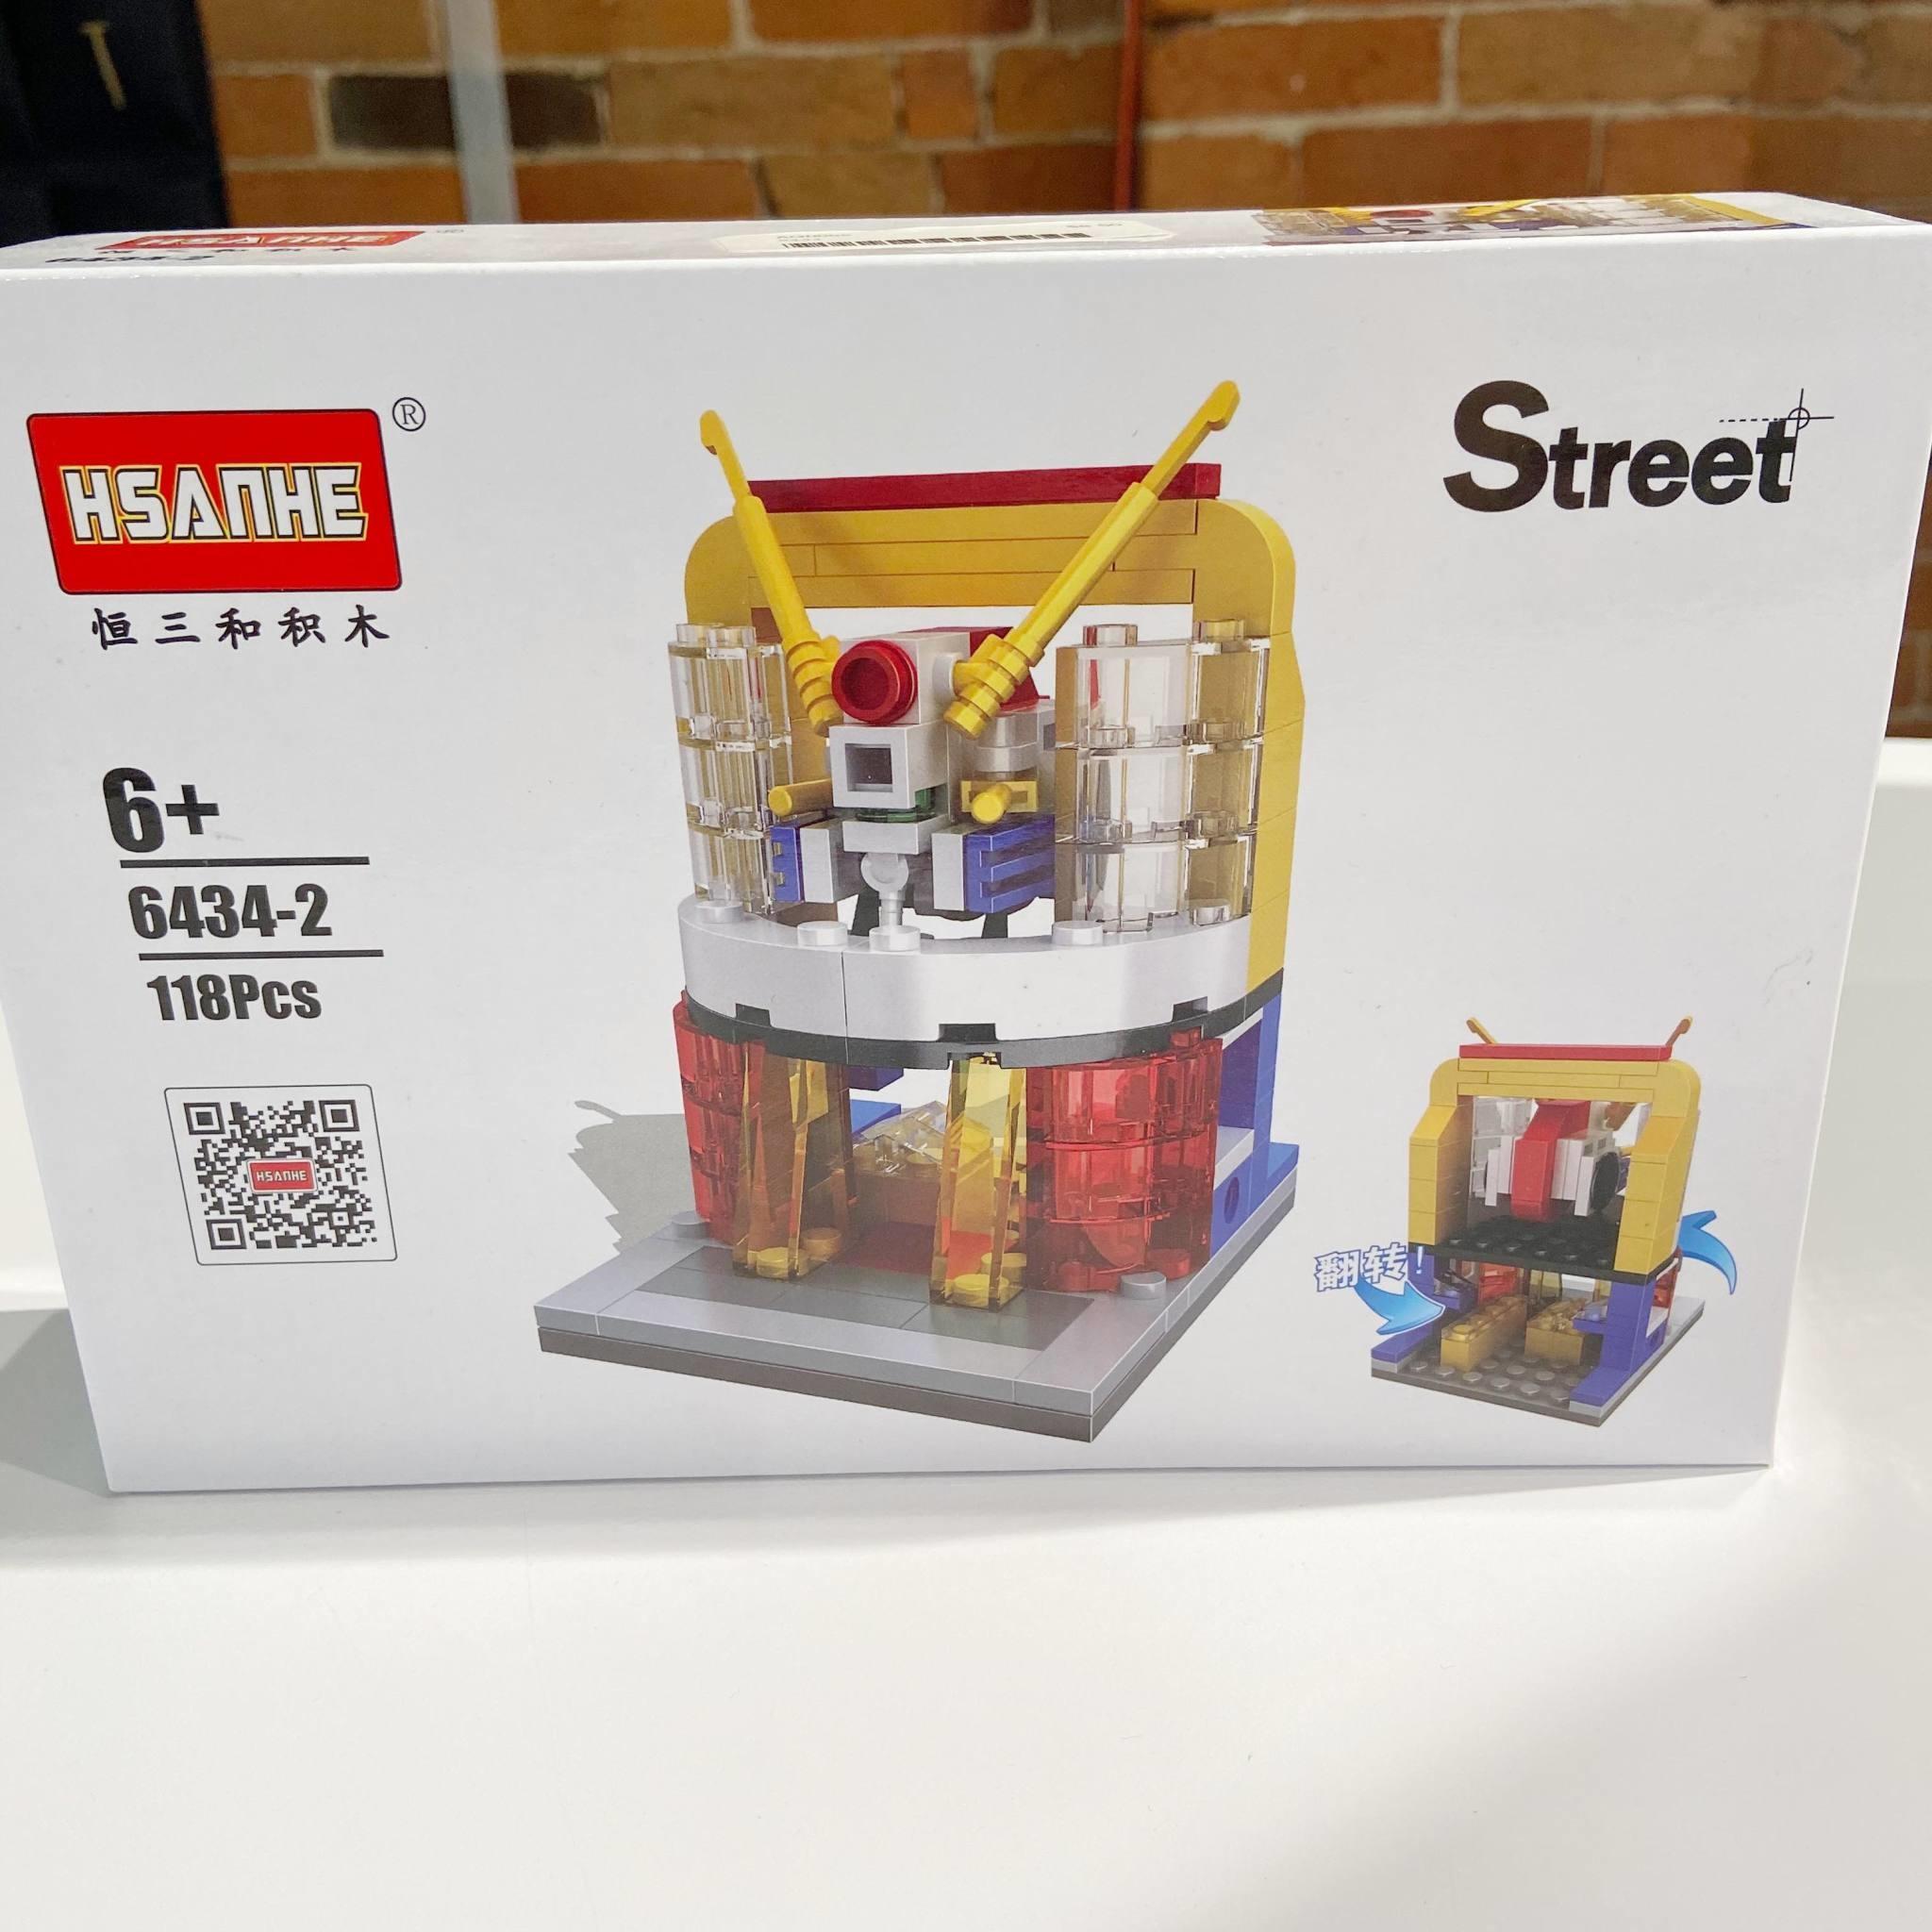 HSANHE Street Building Block 6434